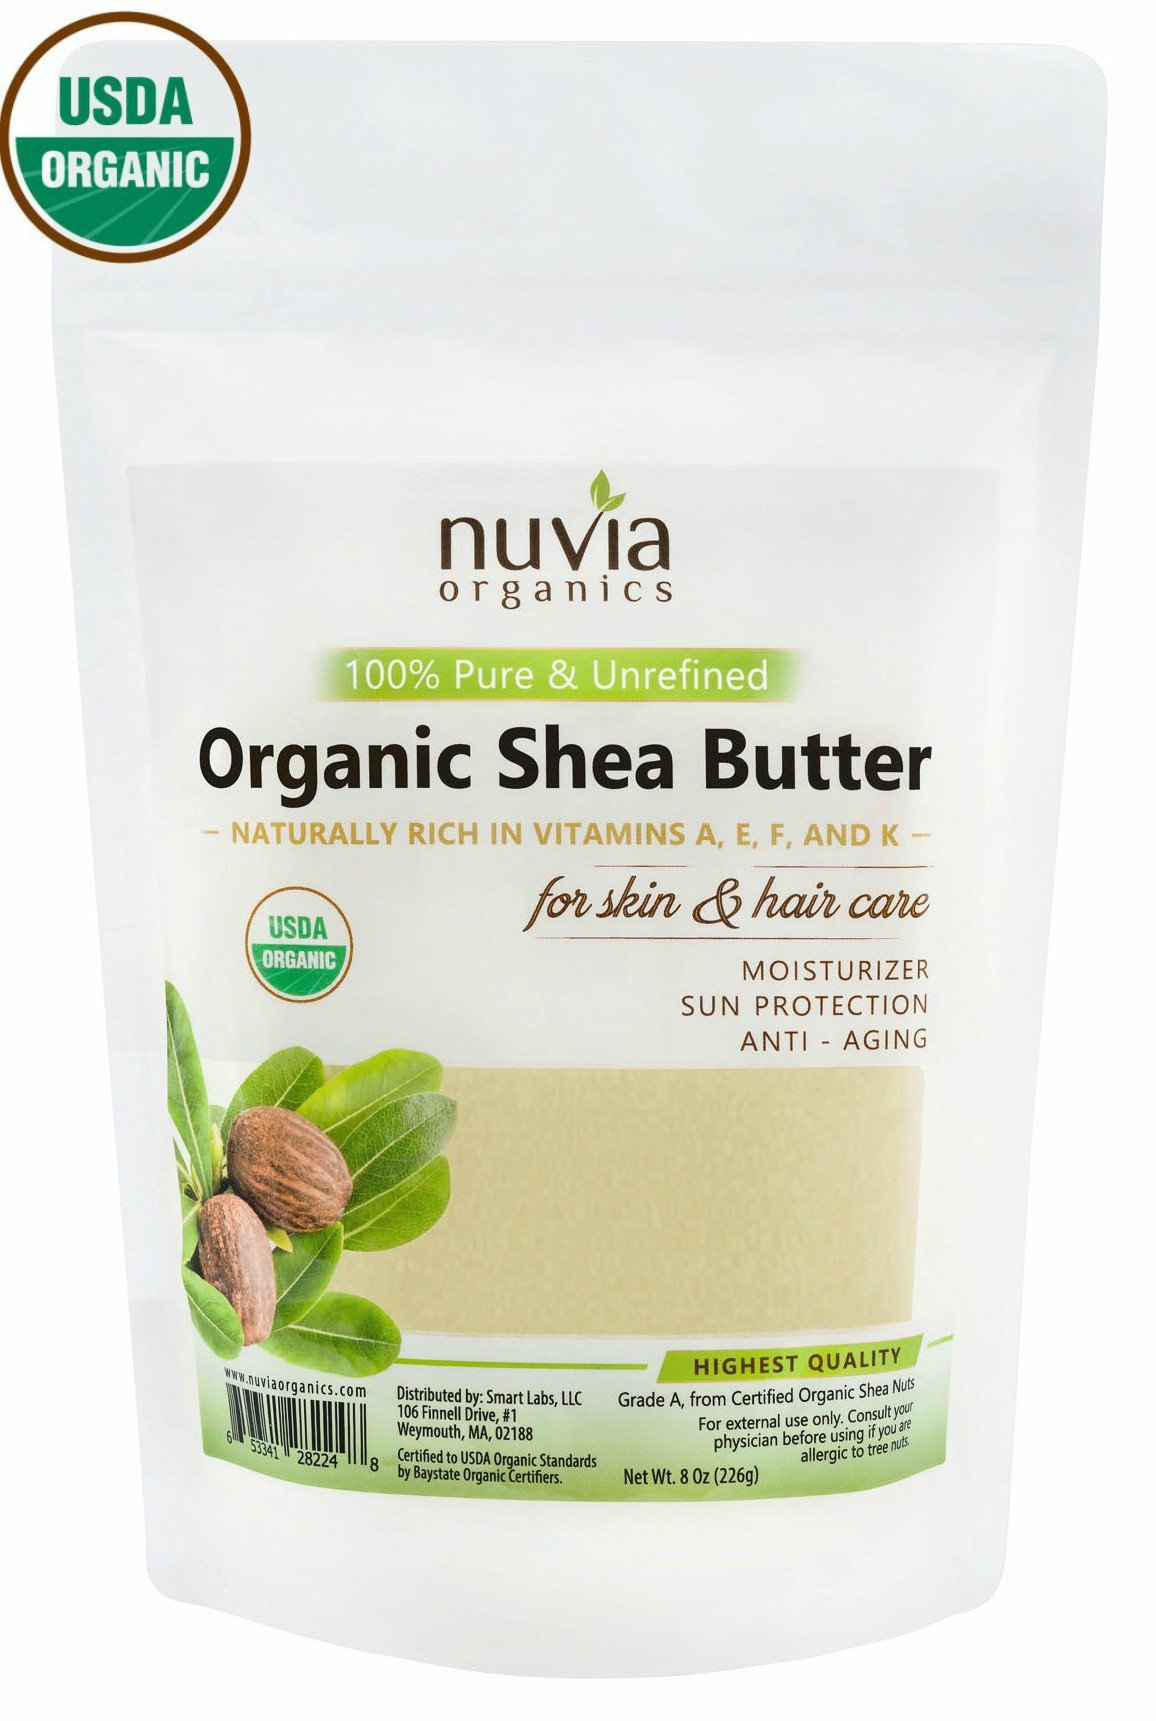 Nuvia Organics Shea Butter - USDA CERTIFIED ORGANIC - 100% Pure & Unrefined; 8 oz